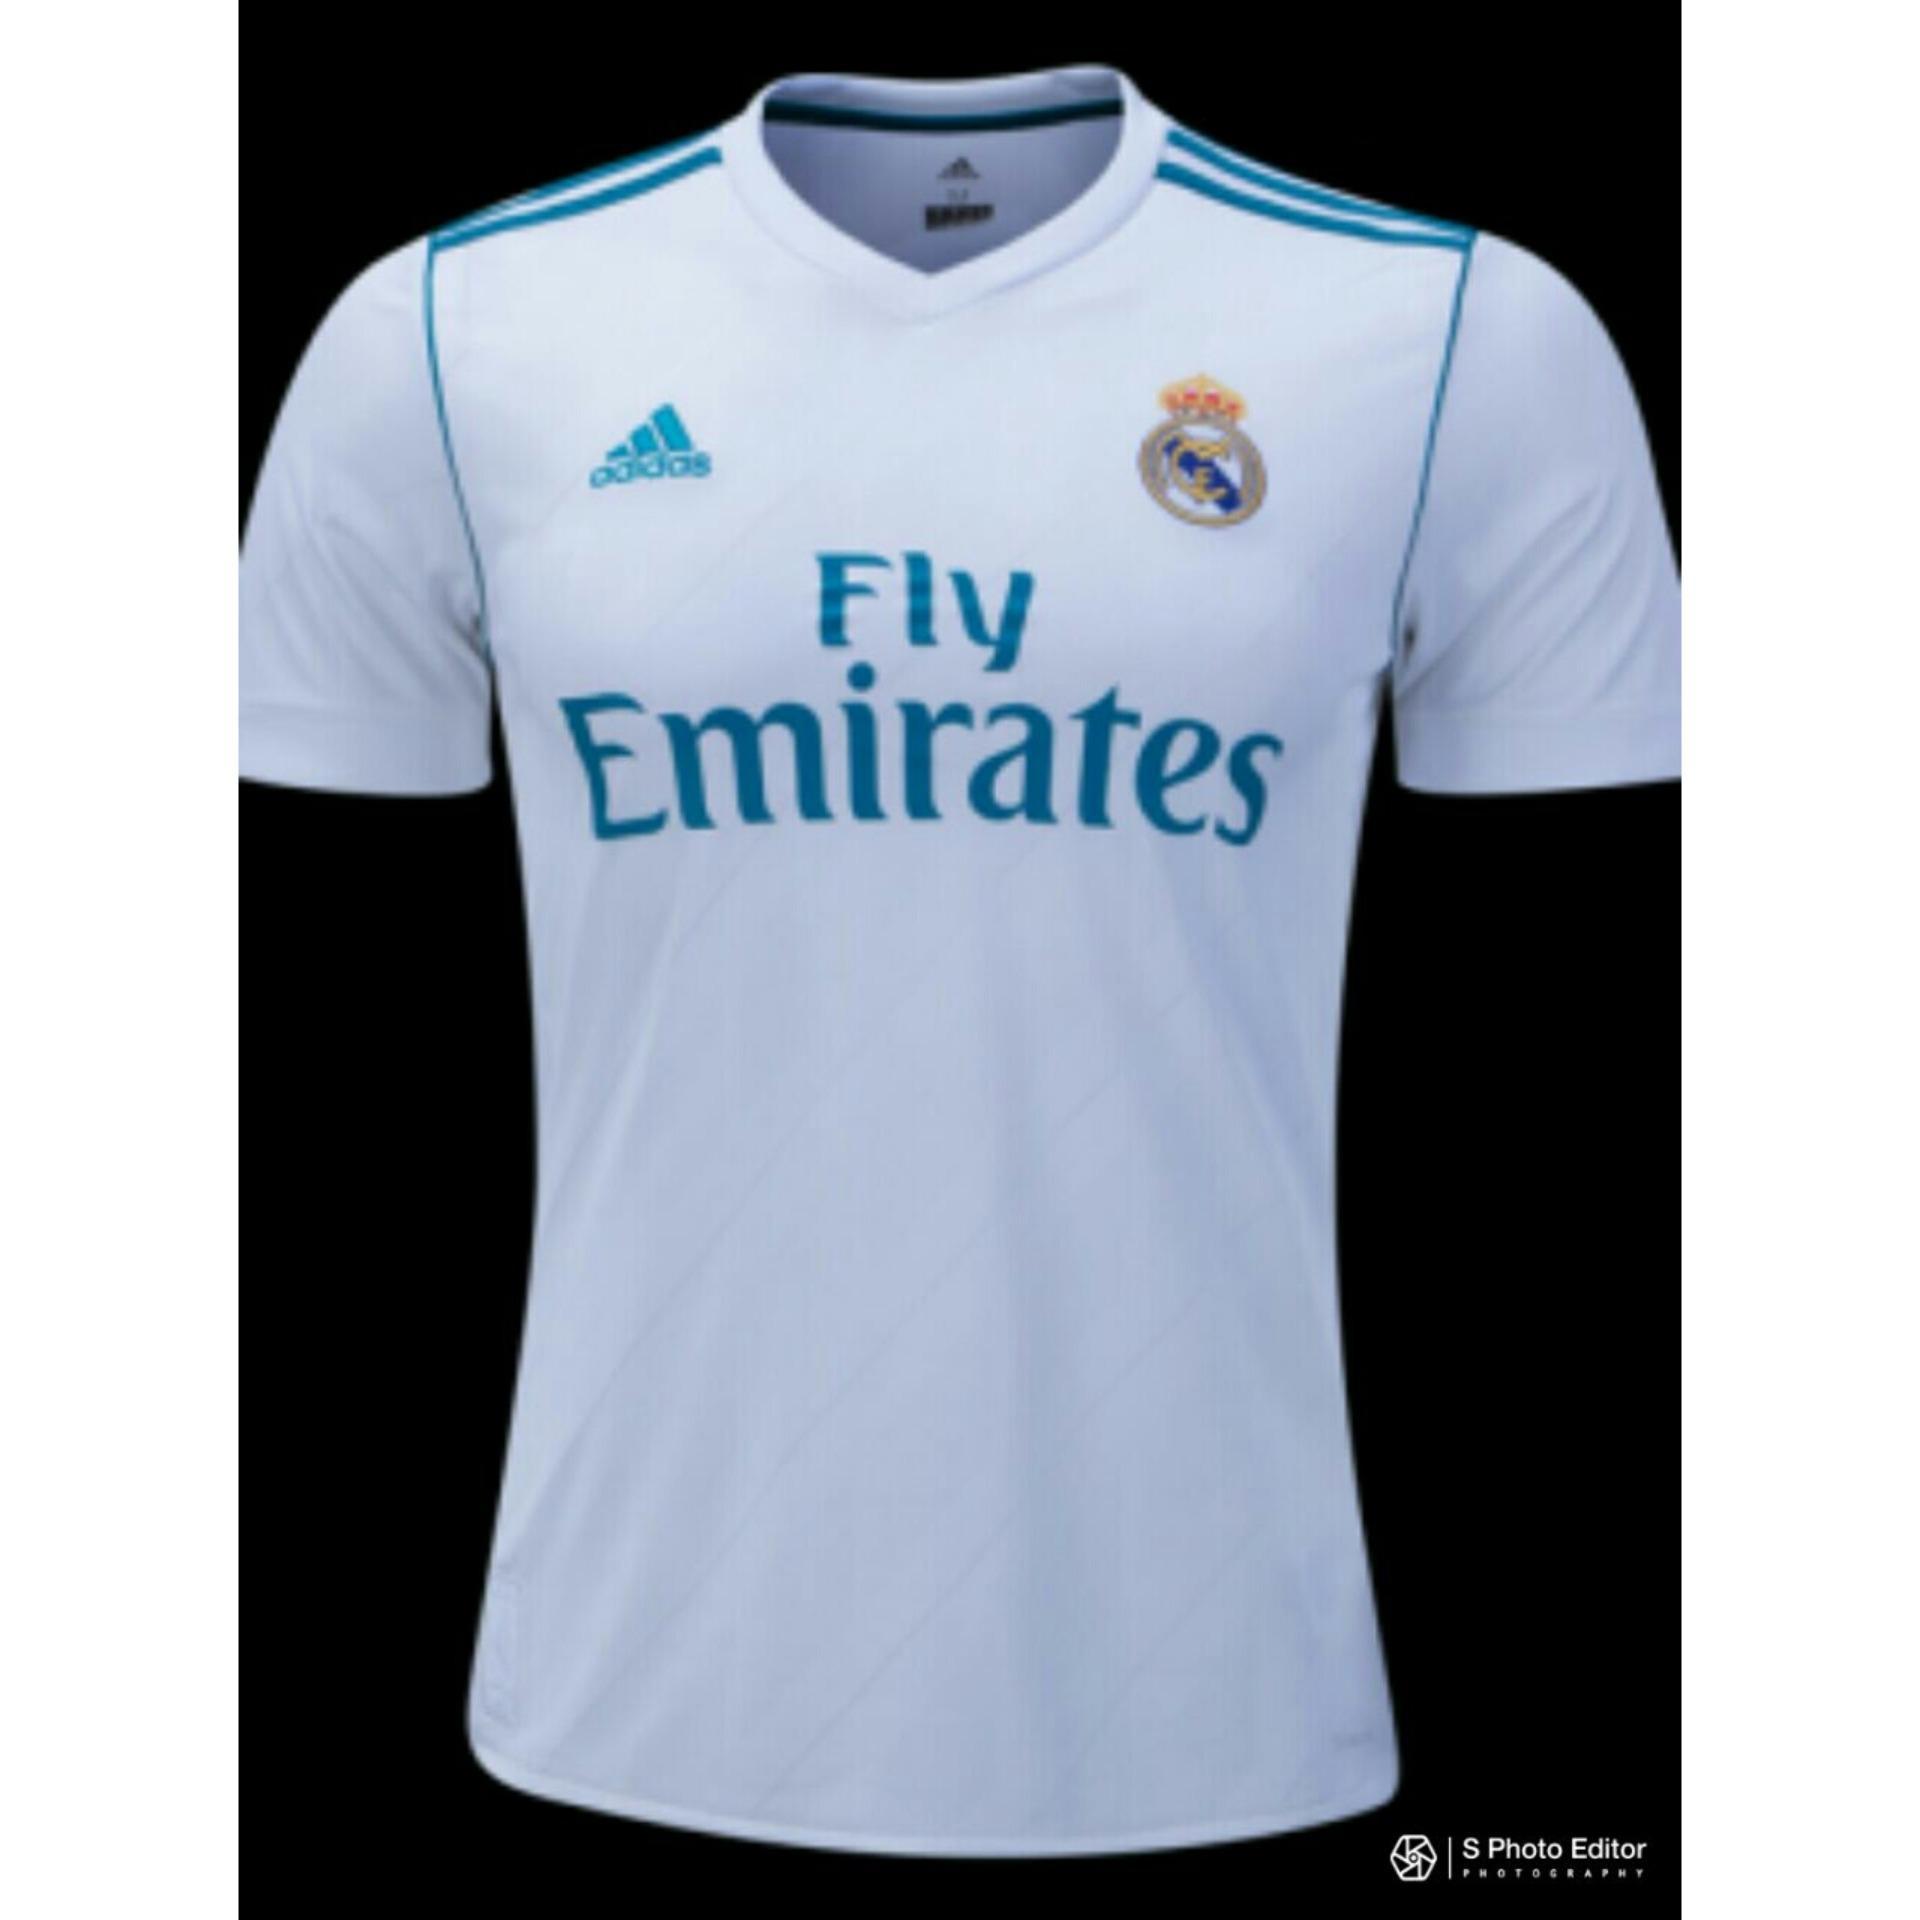 setelan olahraga kaos bola jersey futsal baju volly mizuno abstrak stabilo. TBK - Jersey Bola Kaos T-shirt Bola Madrid 20017/2018